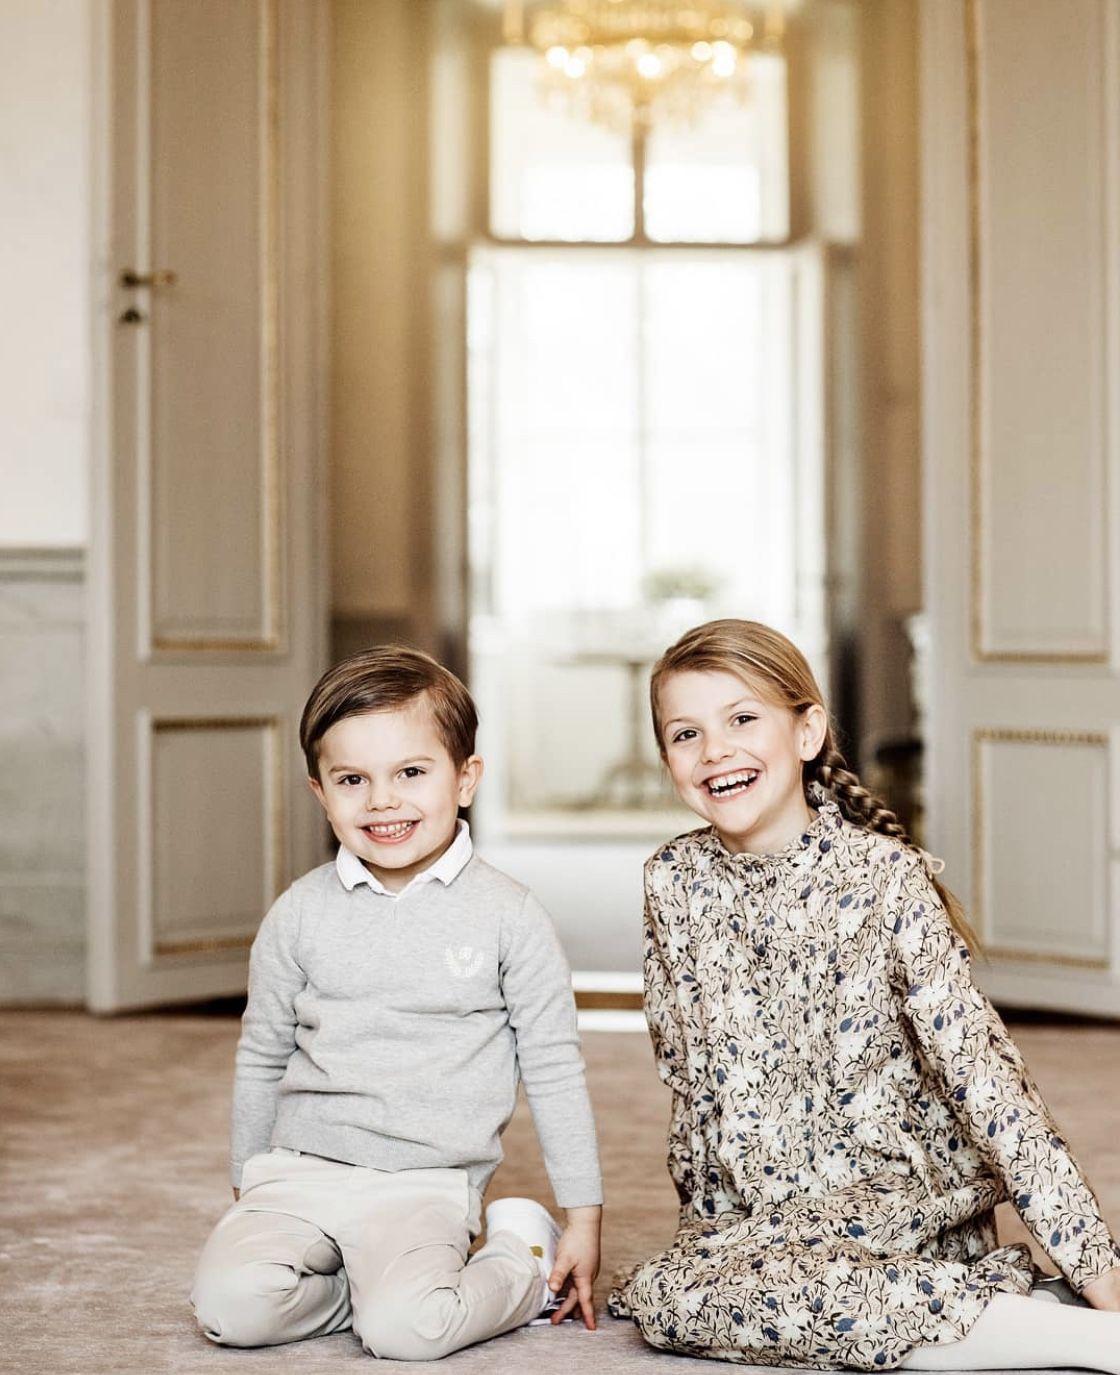 23.2.2020 Happy 8th Birthday to Princess Estelle Silvia